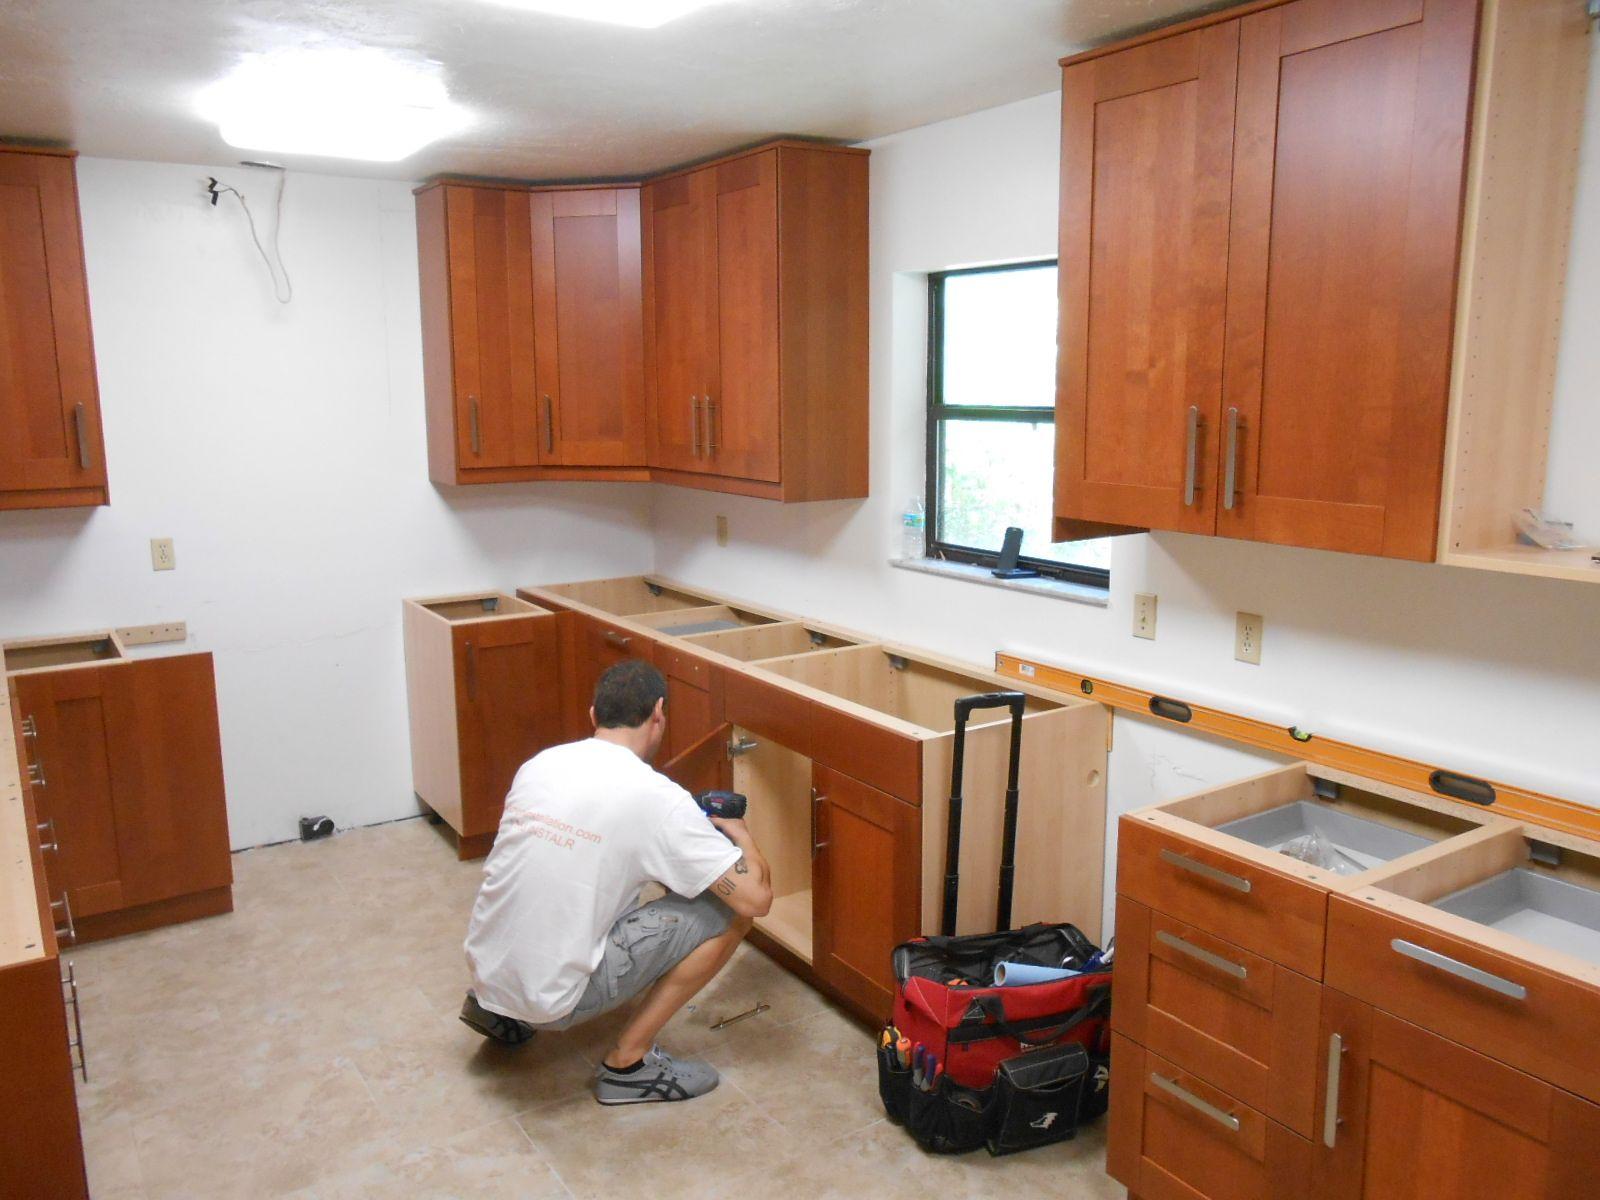 installing ikea kitchen cabinets hanging kitchen cabinets